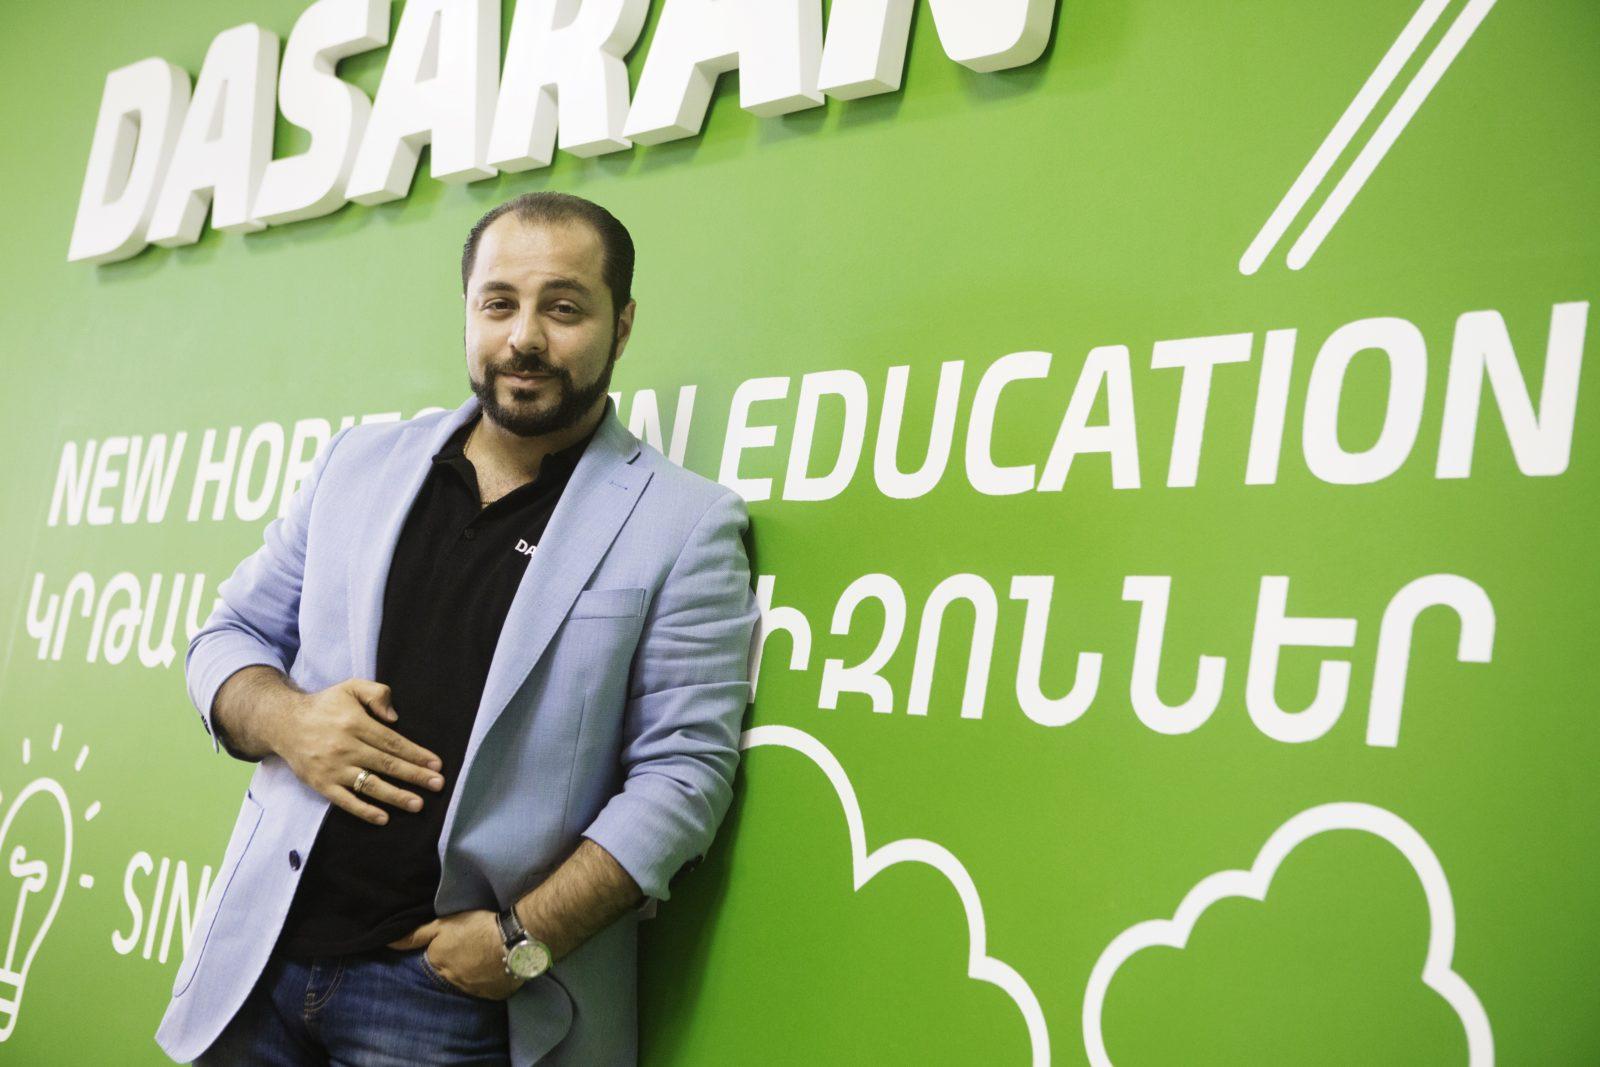 Dasaran-ի մարքեթինգային քայլերը, որոնք բերել են հեղինակություն և ճանաչում